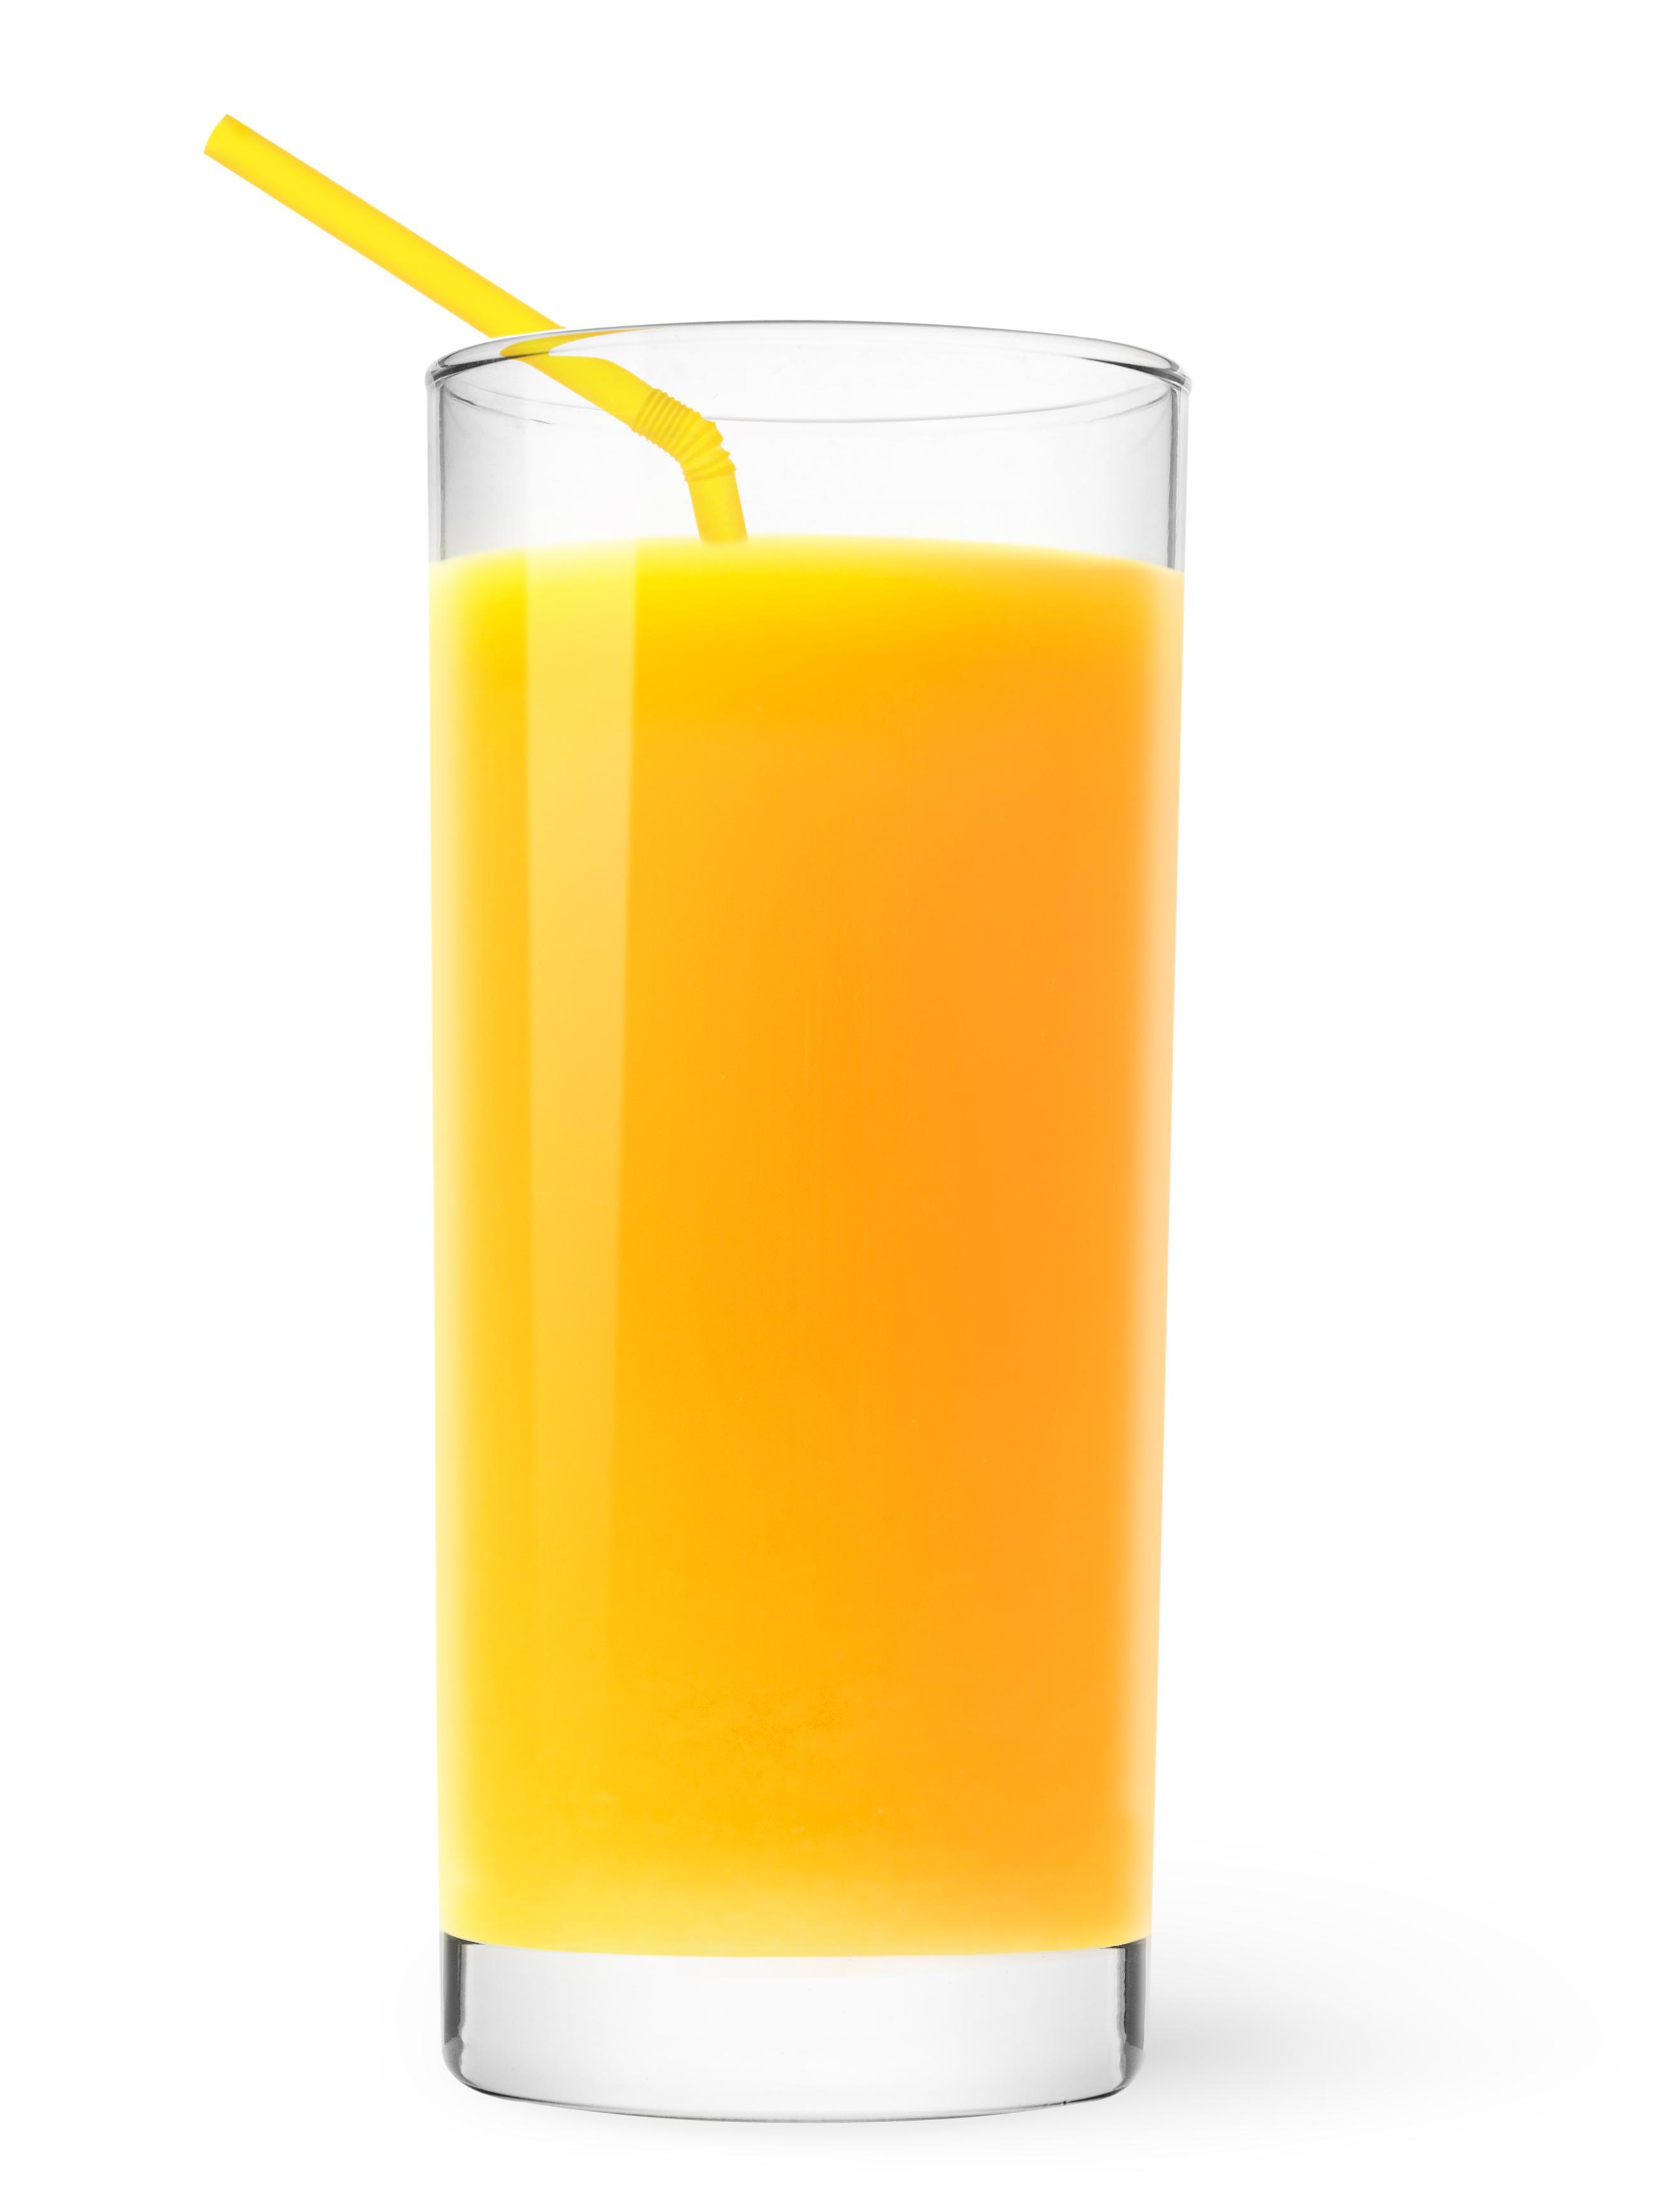 blogger.com : Tropicana Orange Juice, 10 Ounce (Pack of 24) : Fruit Juices : Grocery & Gourmet Food